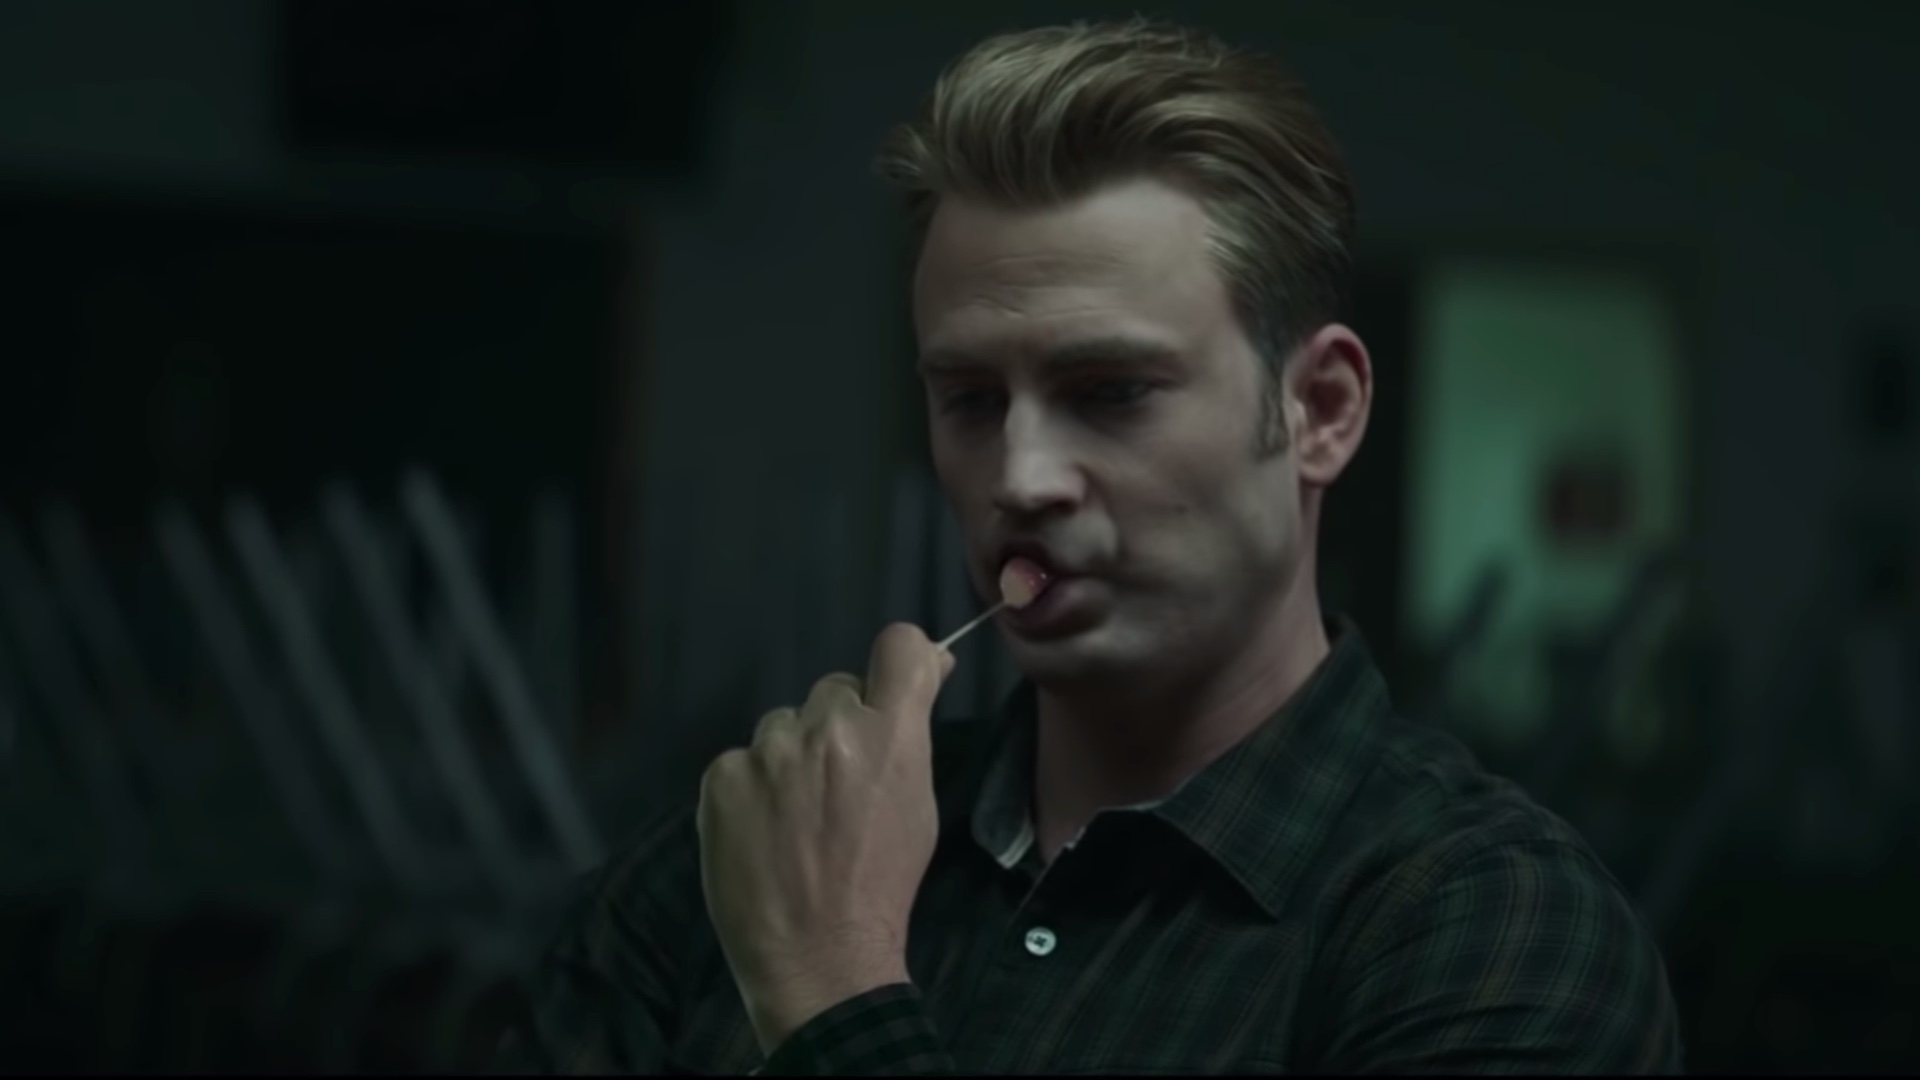 the-avengers-endgame-super-bowl-spot-gets-a-ridiculous-weird-trailer-social.jpg